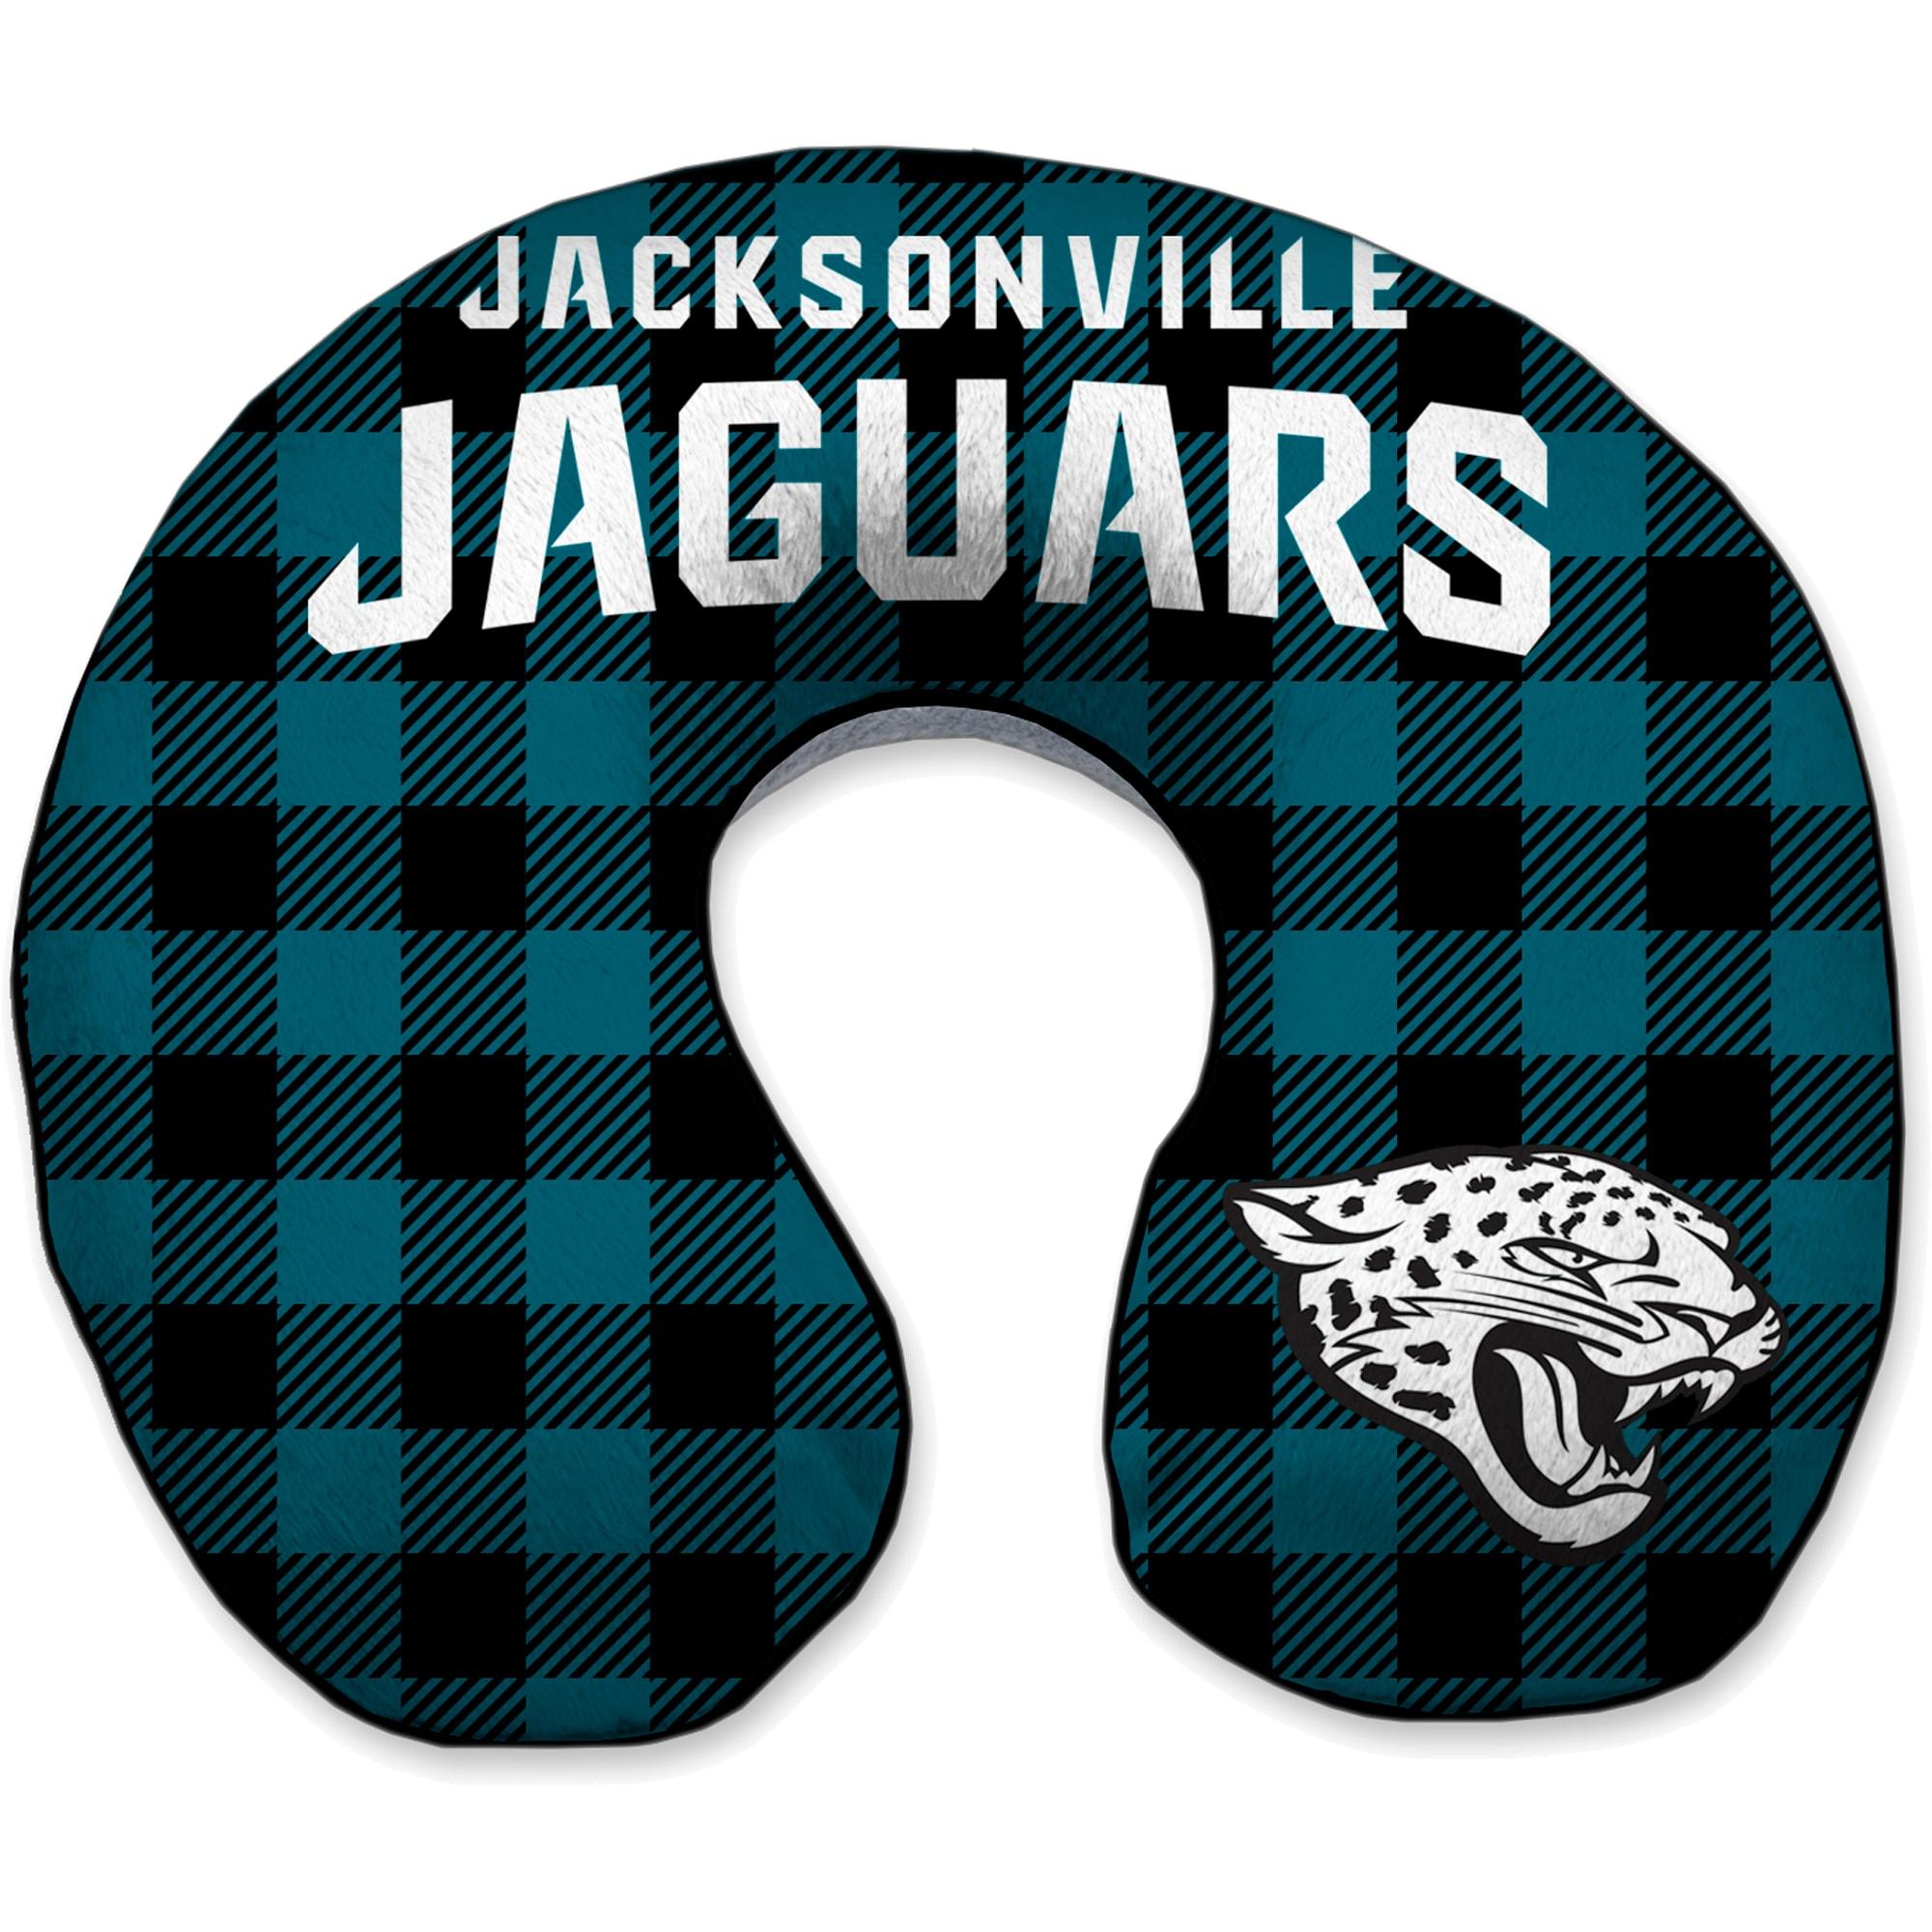 Jacksonville Jaguars Buffalo Check Sherpa Memory Foam Travel Pillow - Green